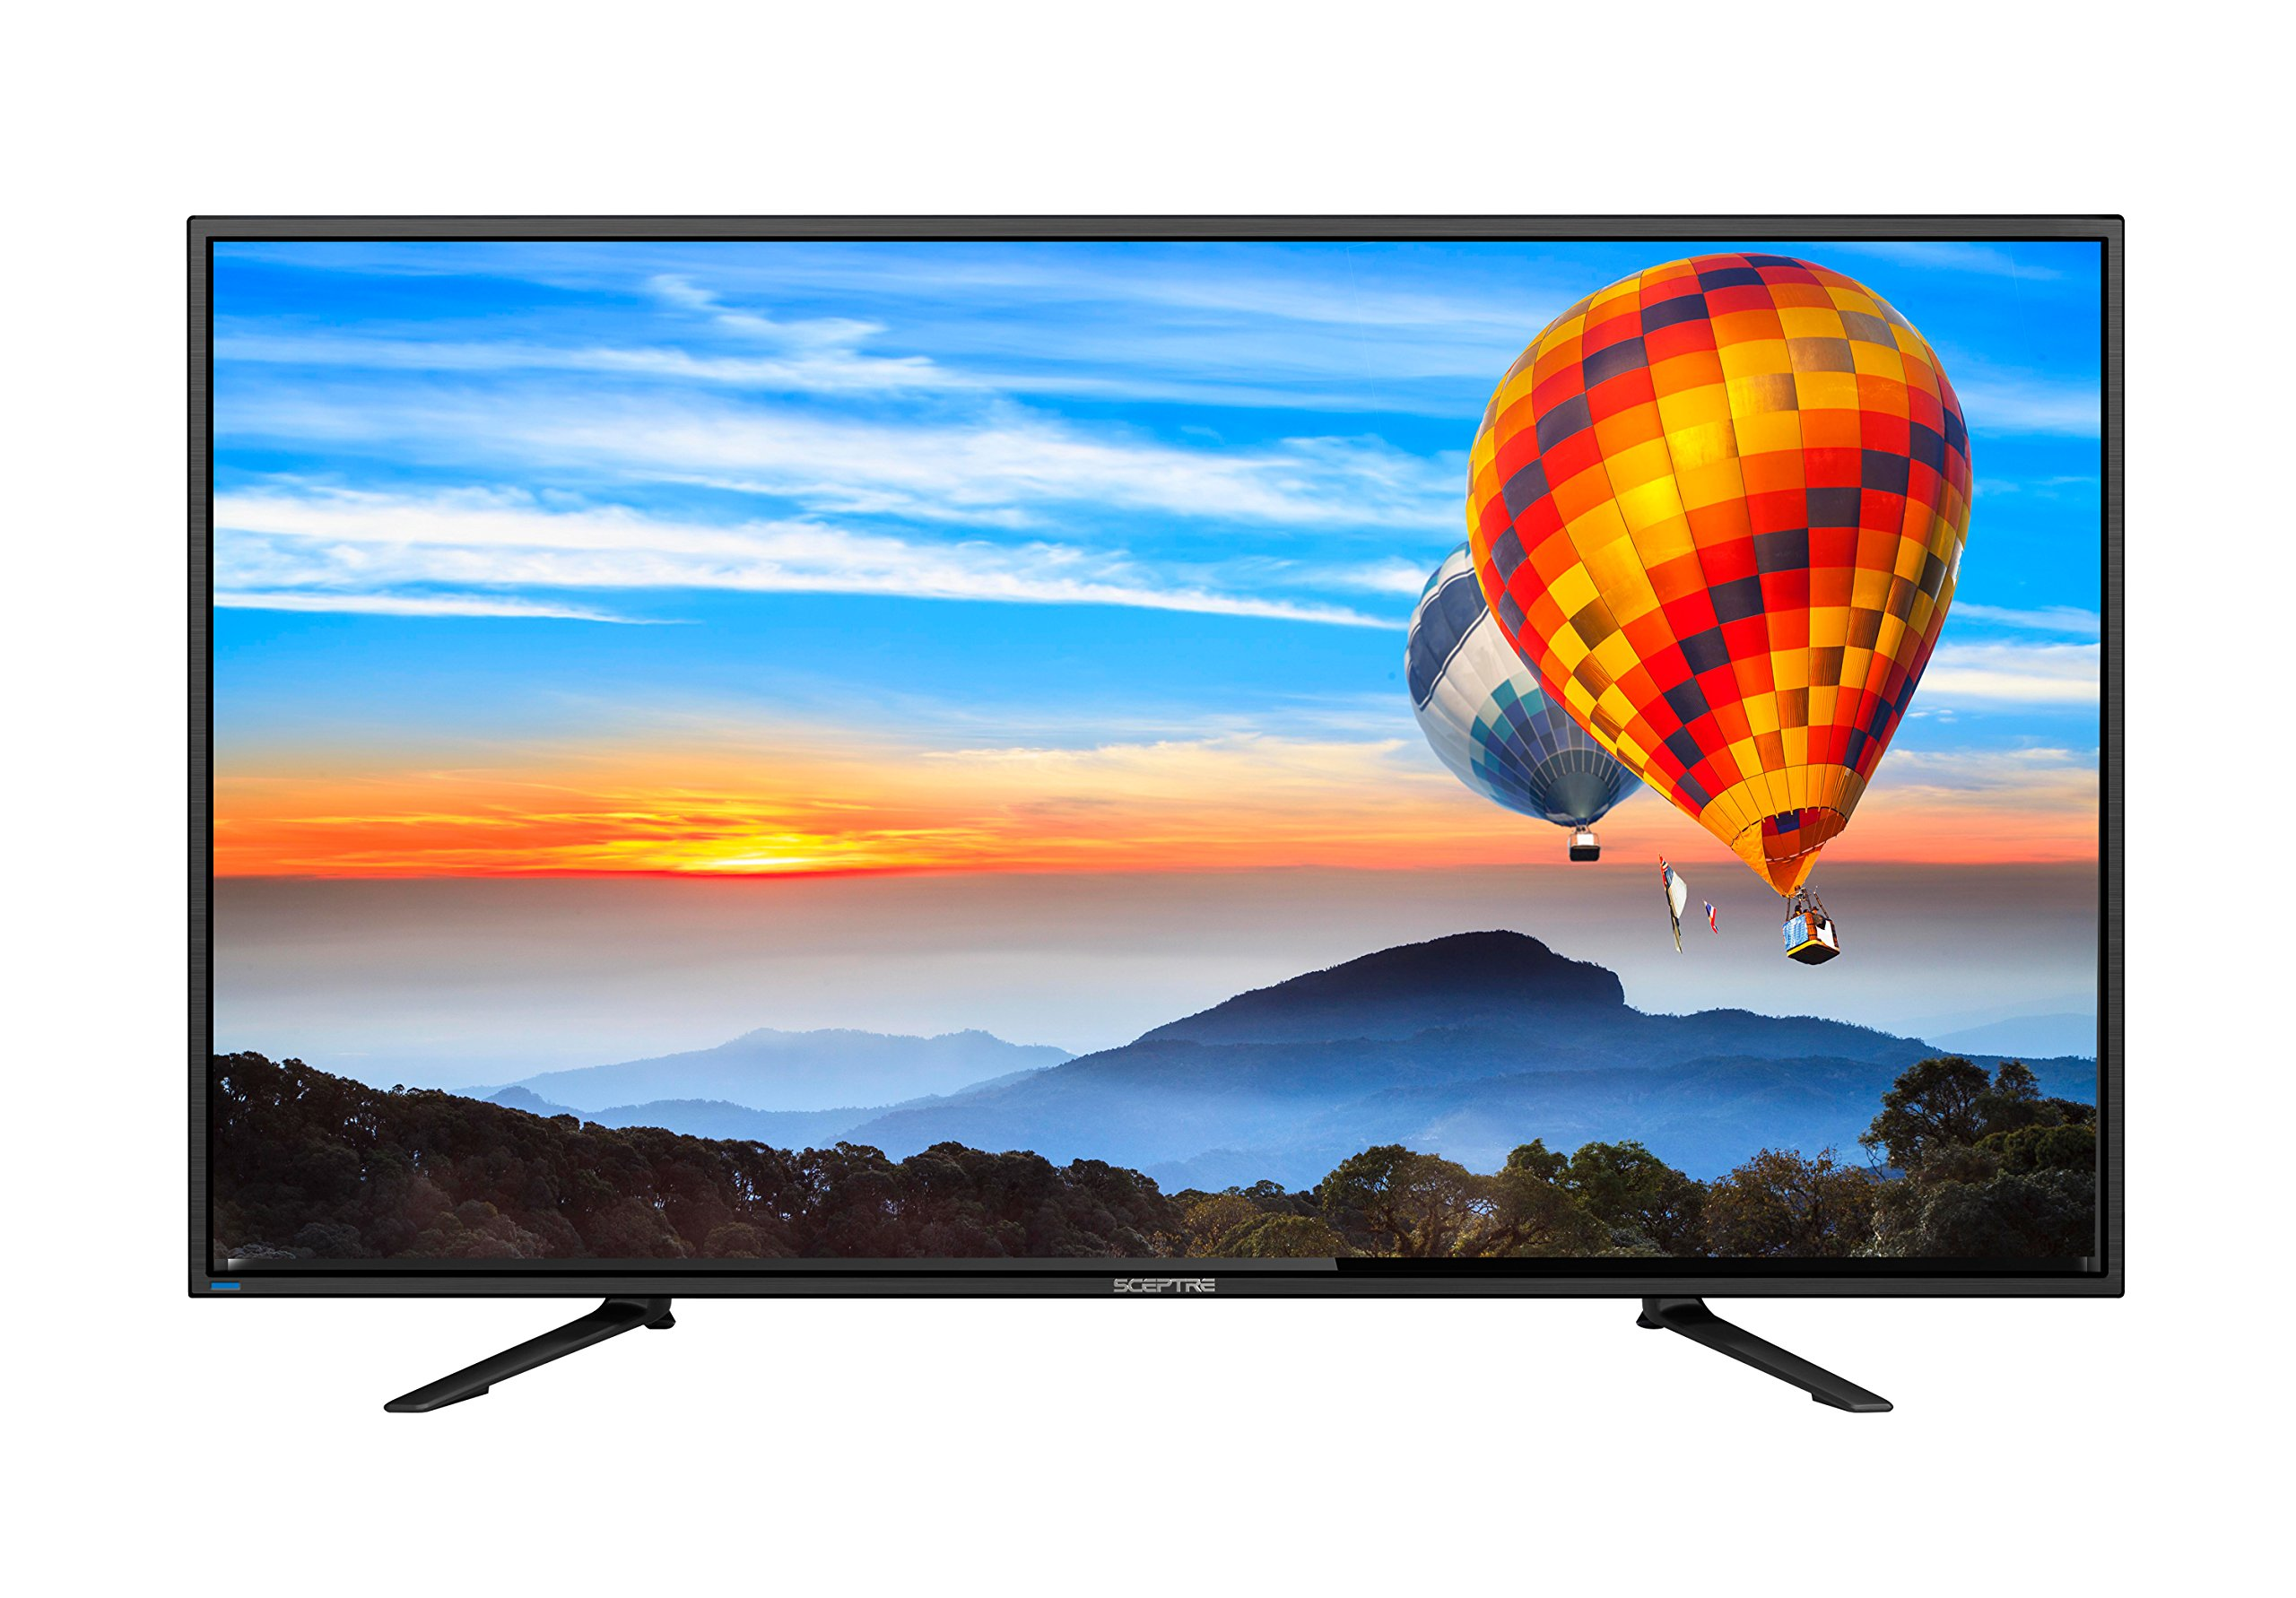 Sceptre 65 inches 4K 3840 x 2160 LED TV U658CV-UMC Metal Black 2018 by Sceptre